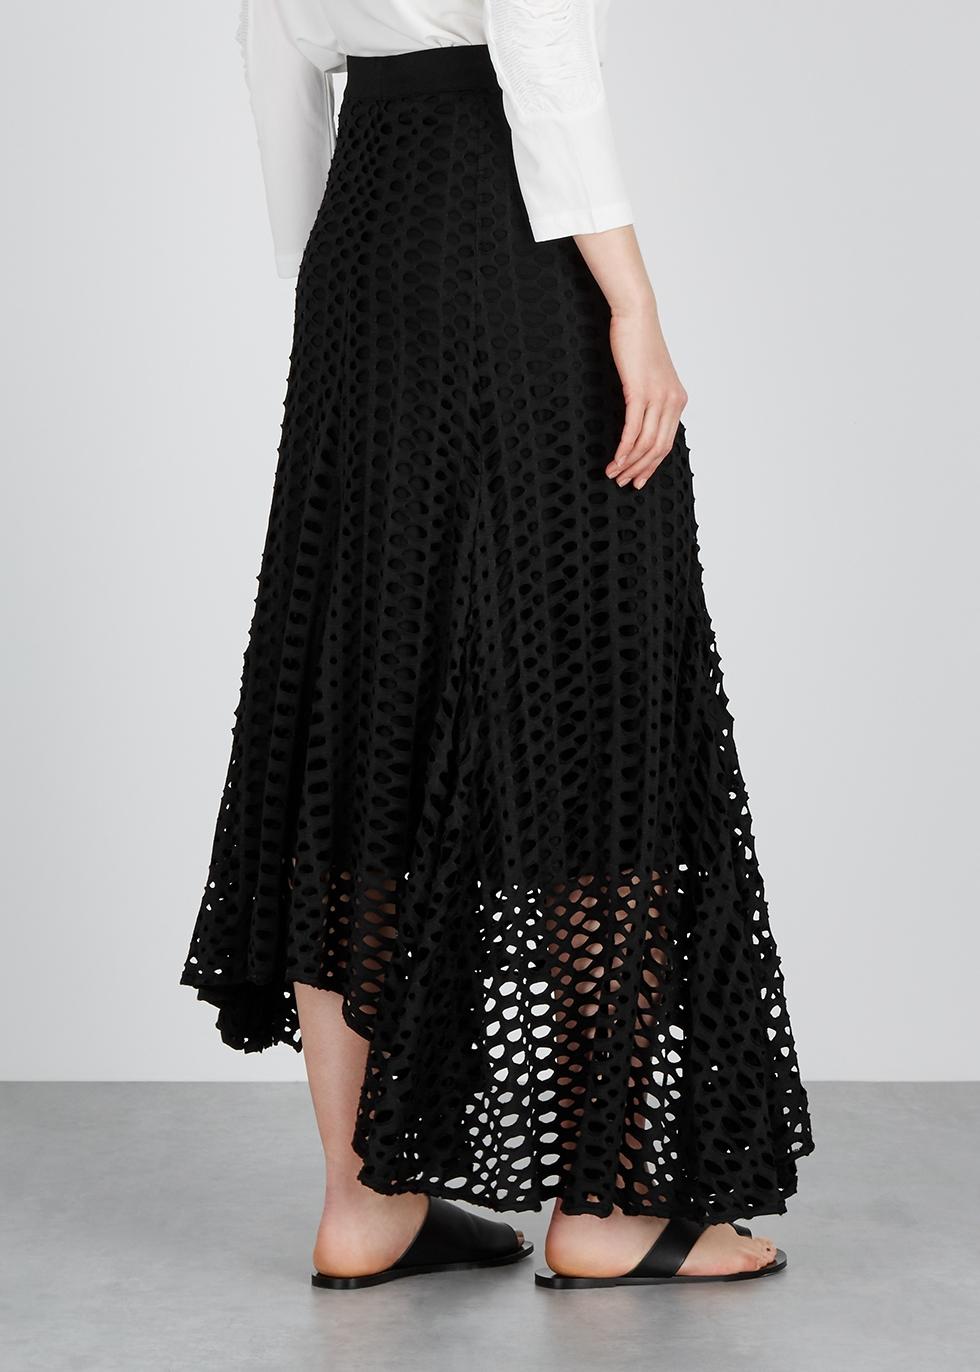 Black pointelle-knit jersey midi skirt - BY MALENE BIRGER